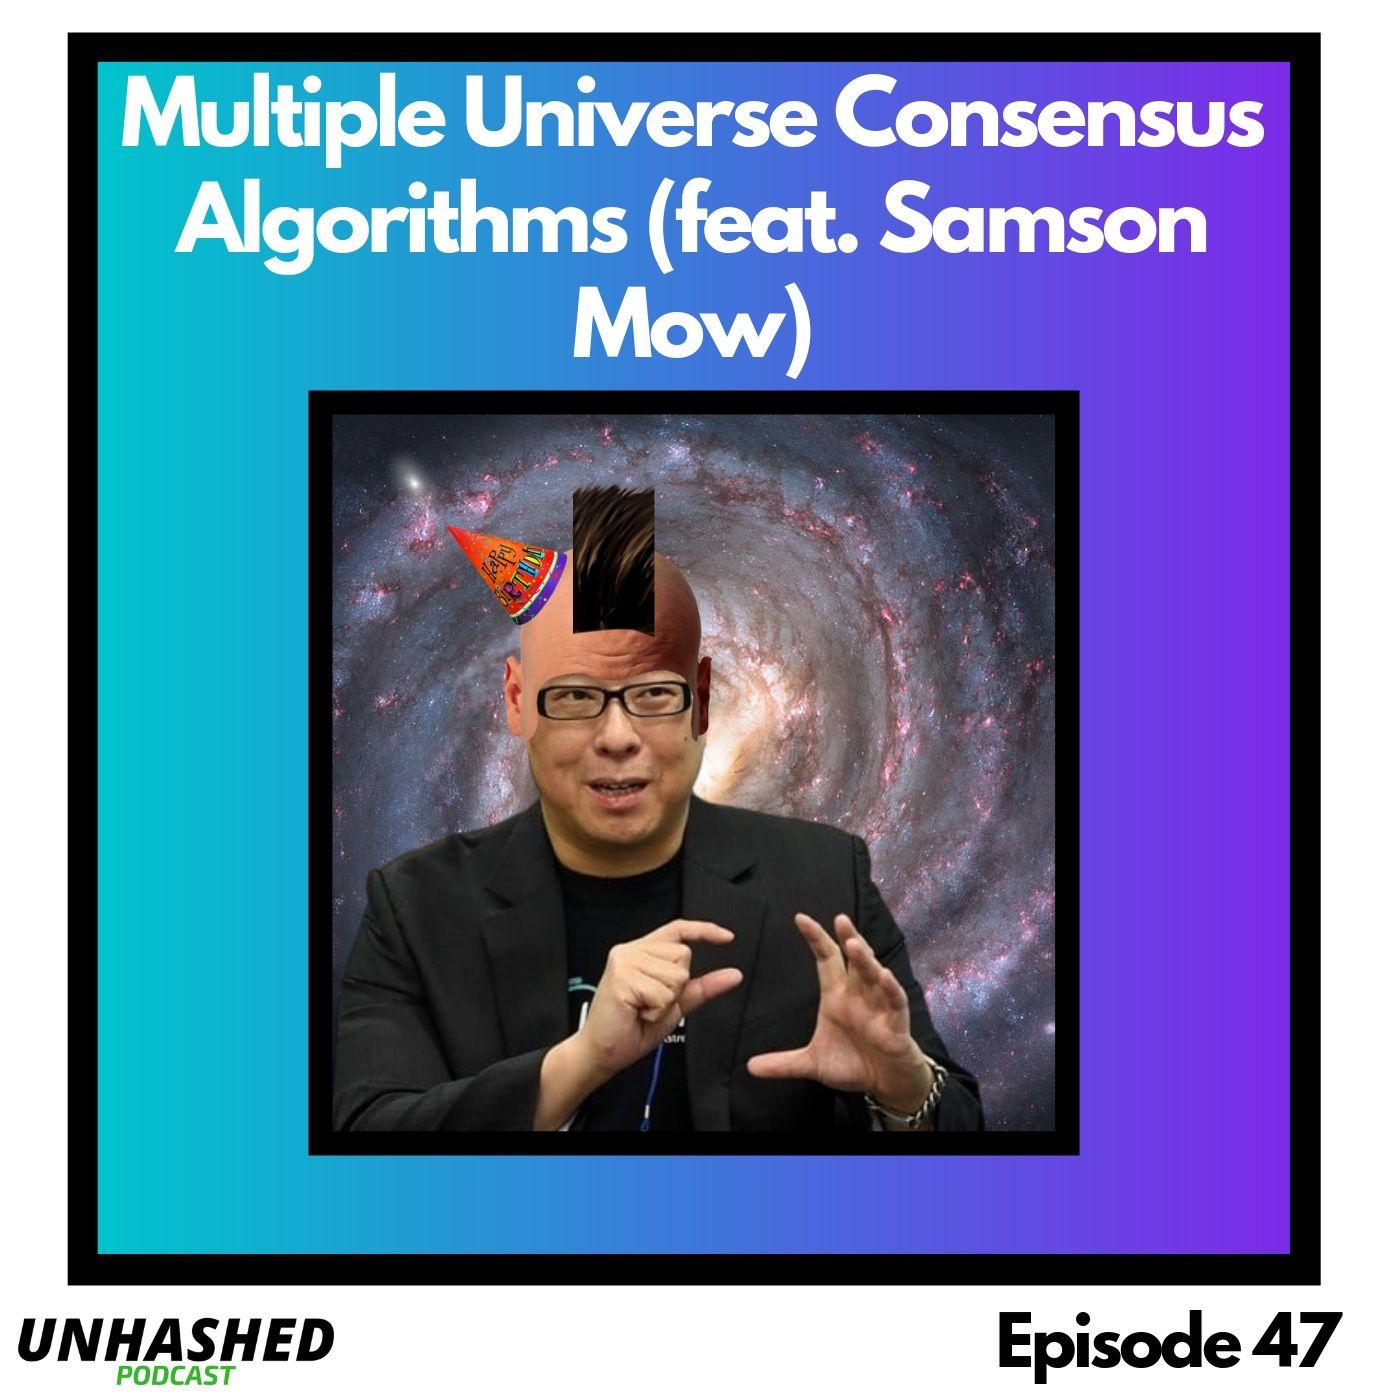 Multiple Universe Consensus Algorithms (feat. Samson Mow)